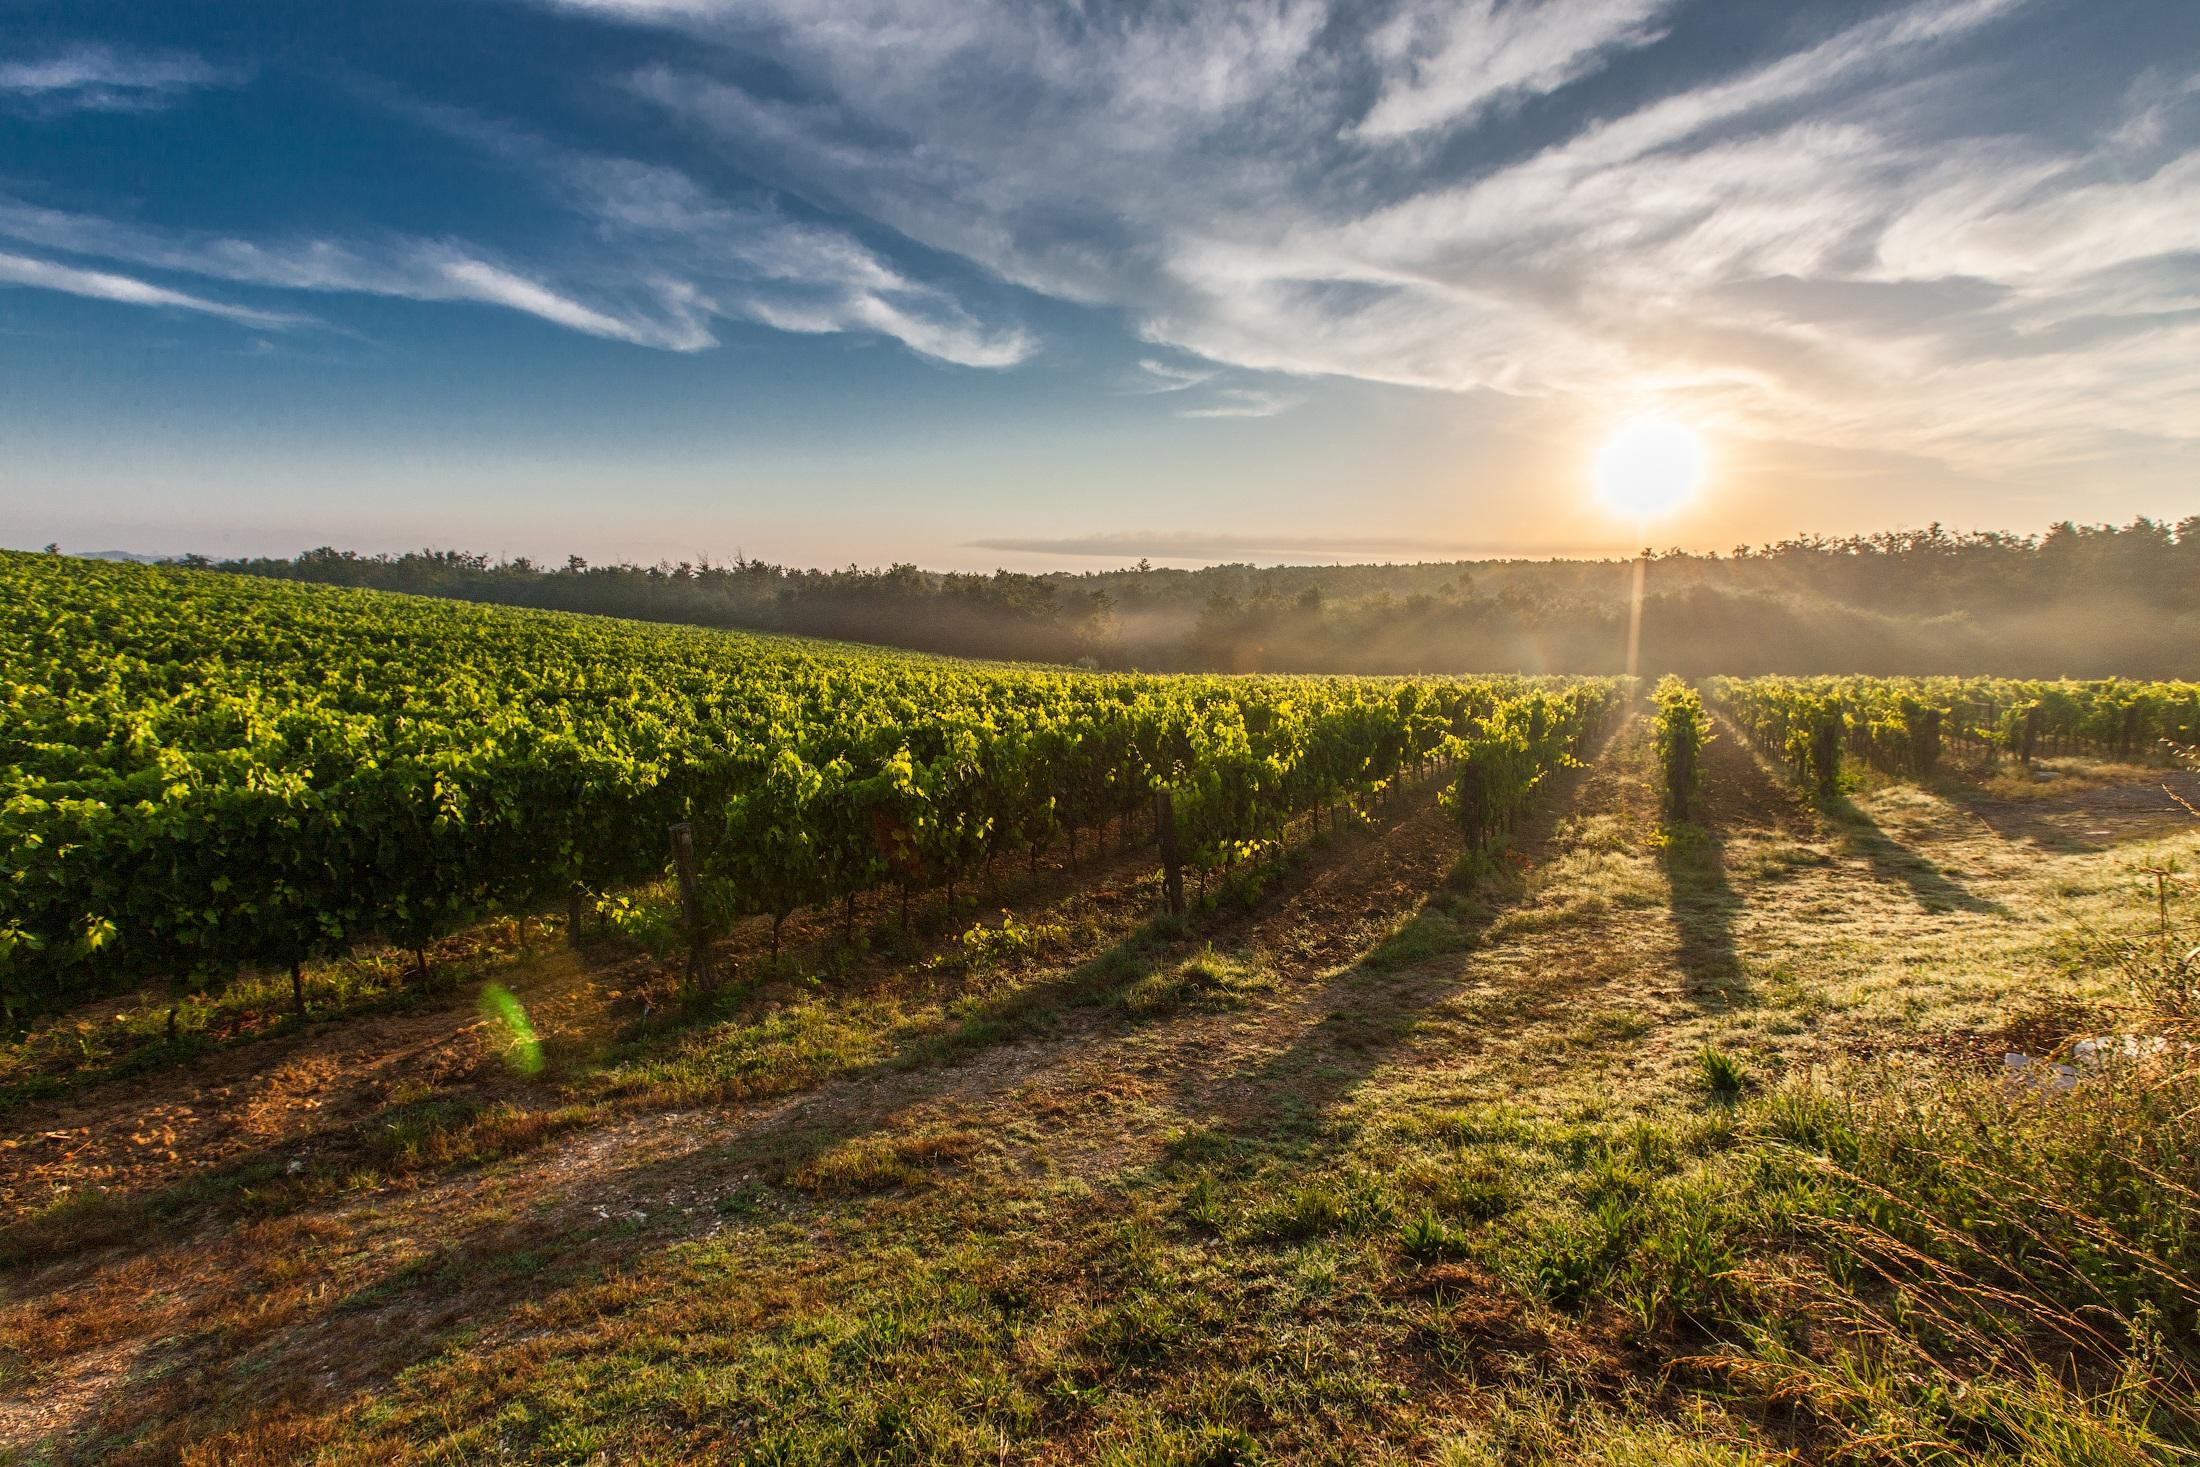 A grape field.